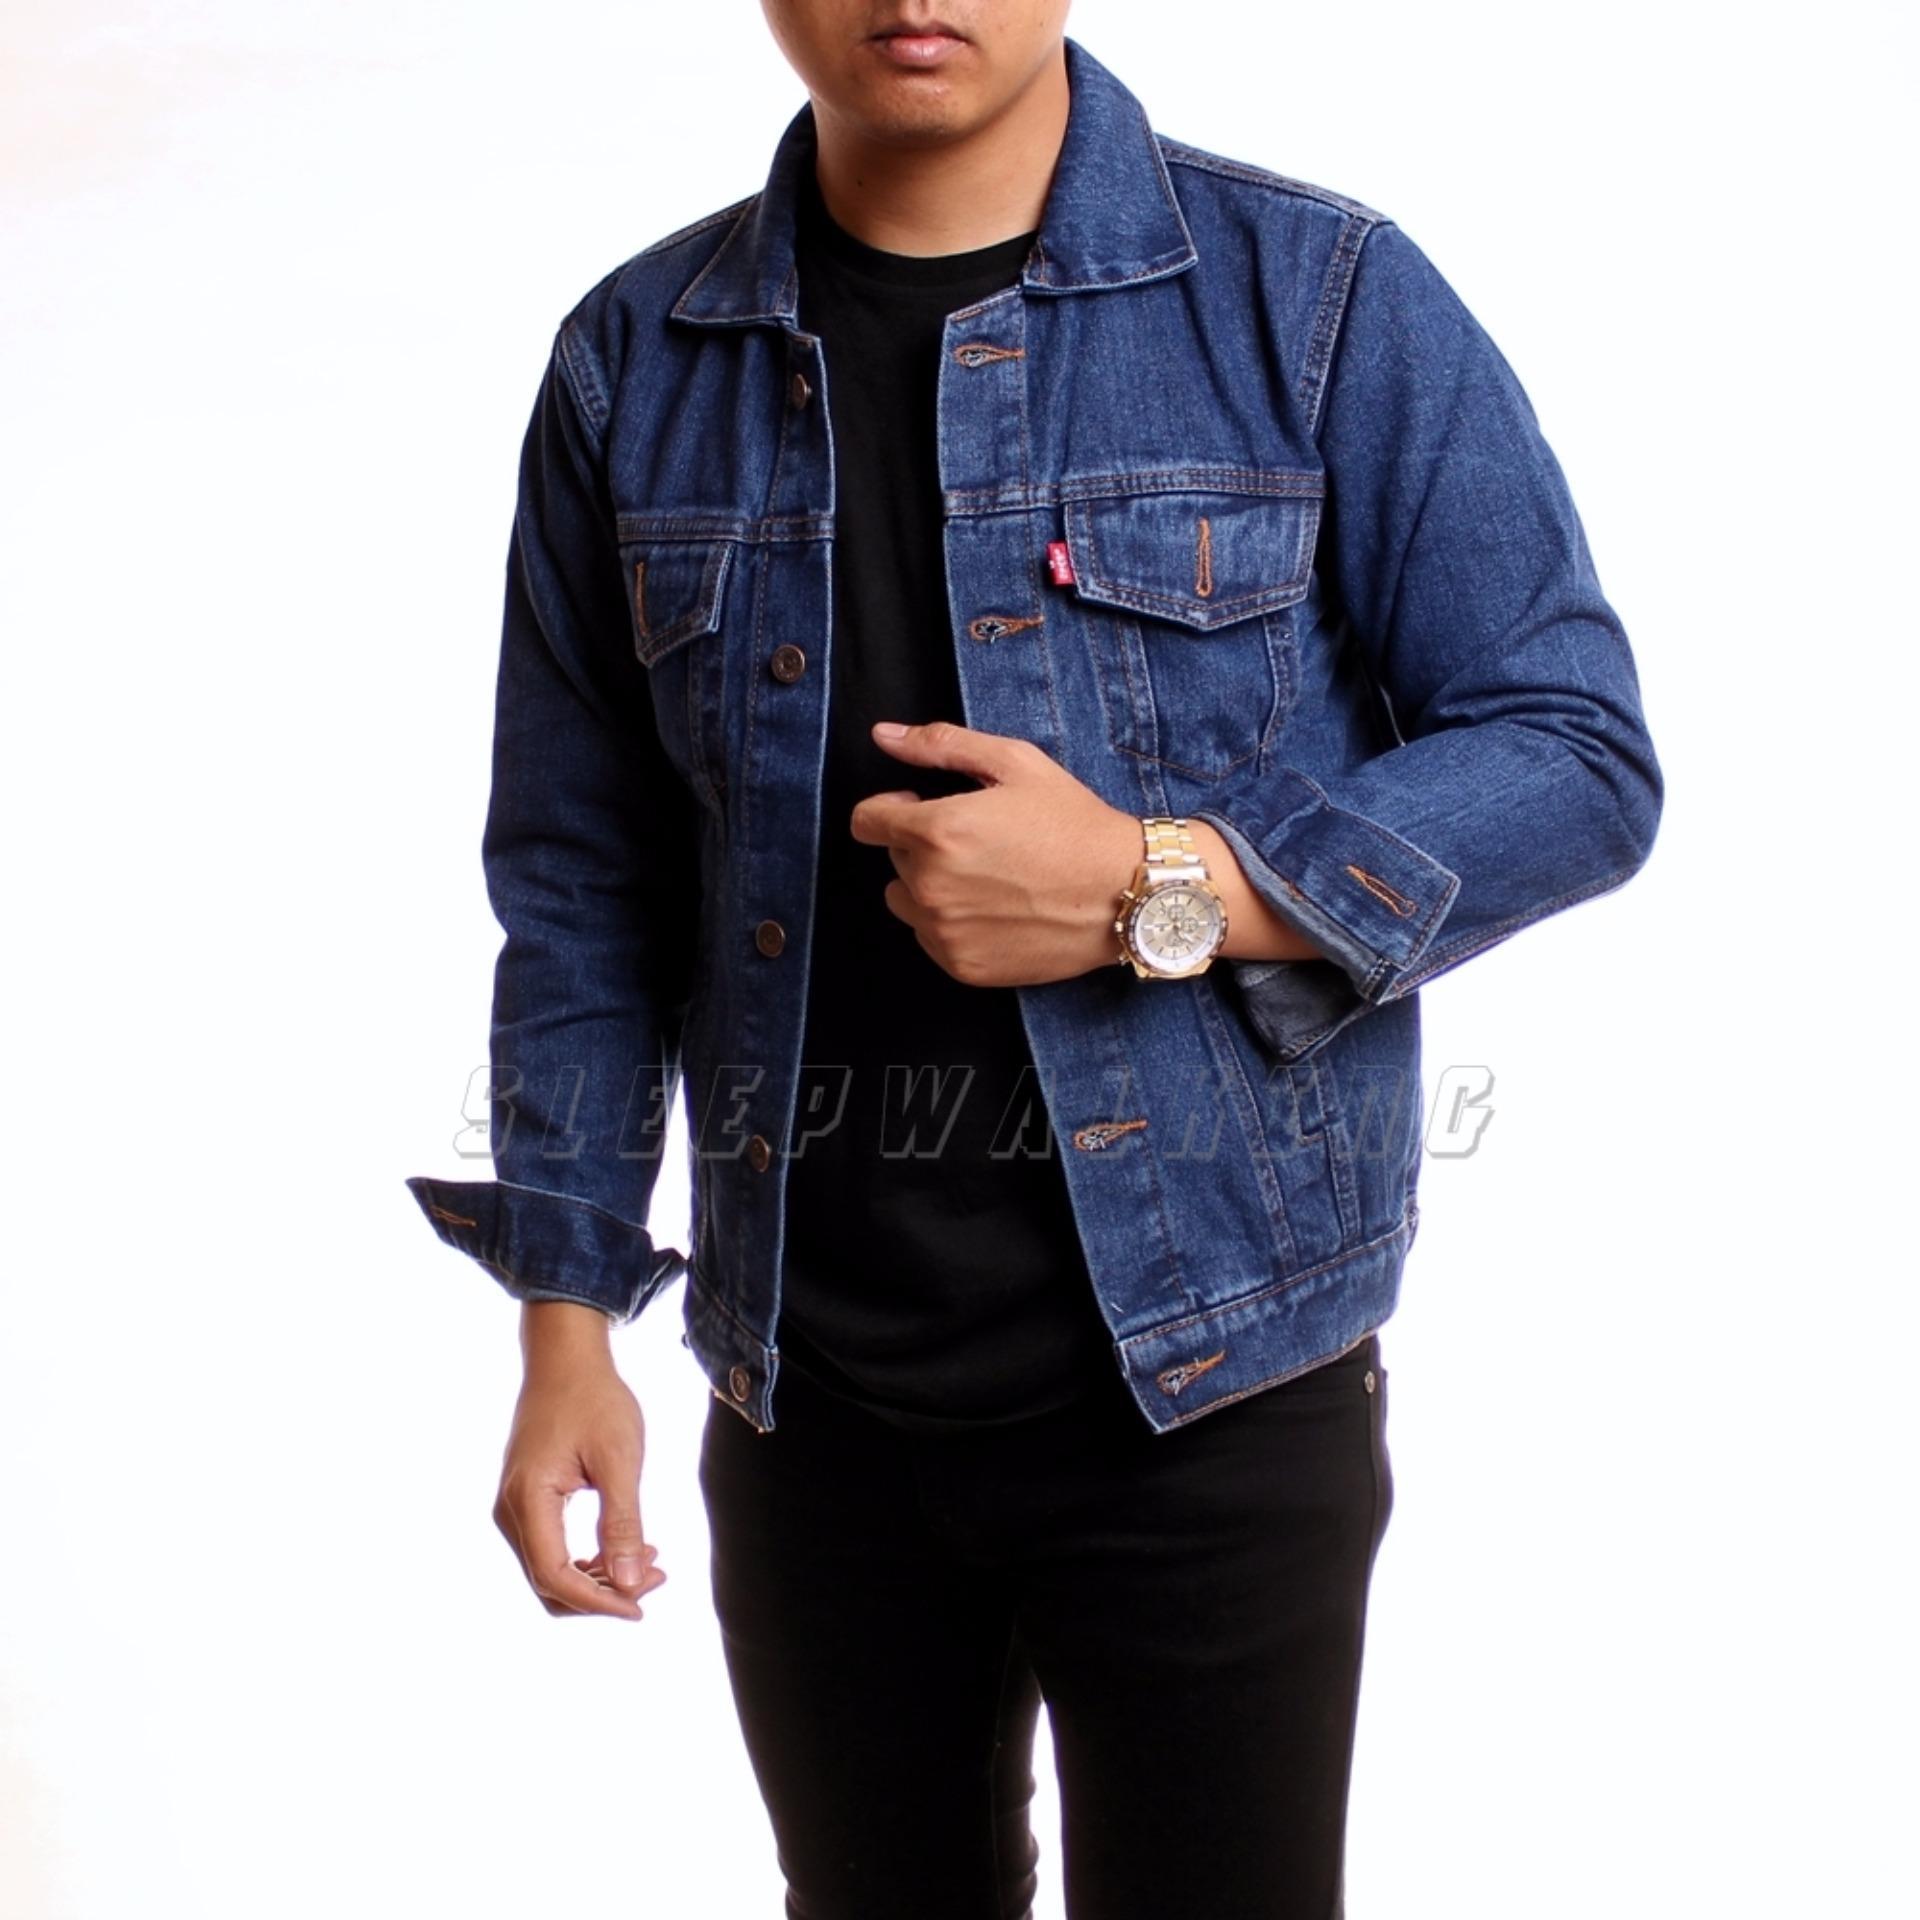 Daftar Harga Sw Jaket Jeans Pria Biowash Sleepwalking